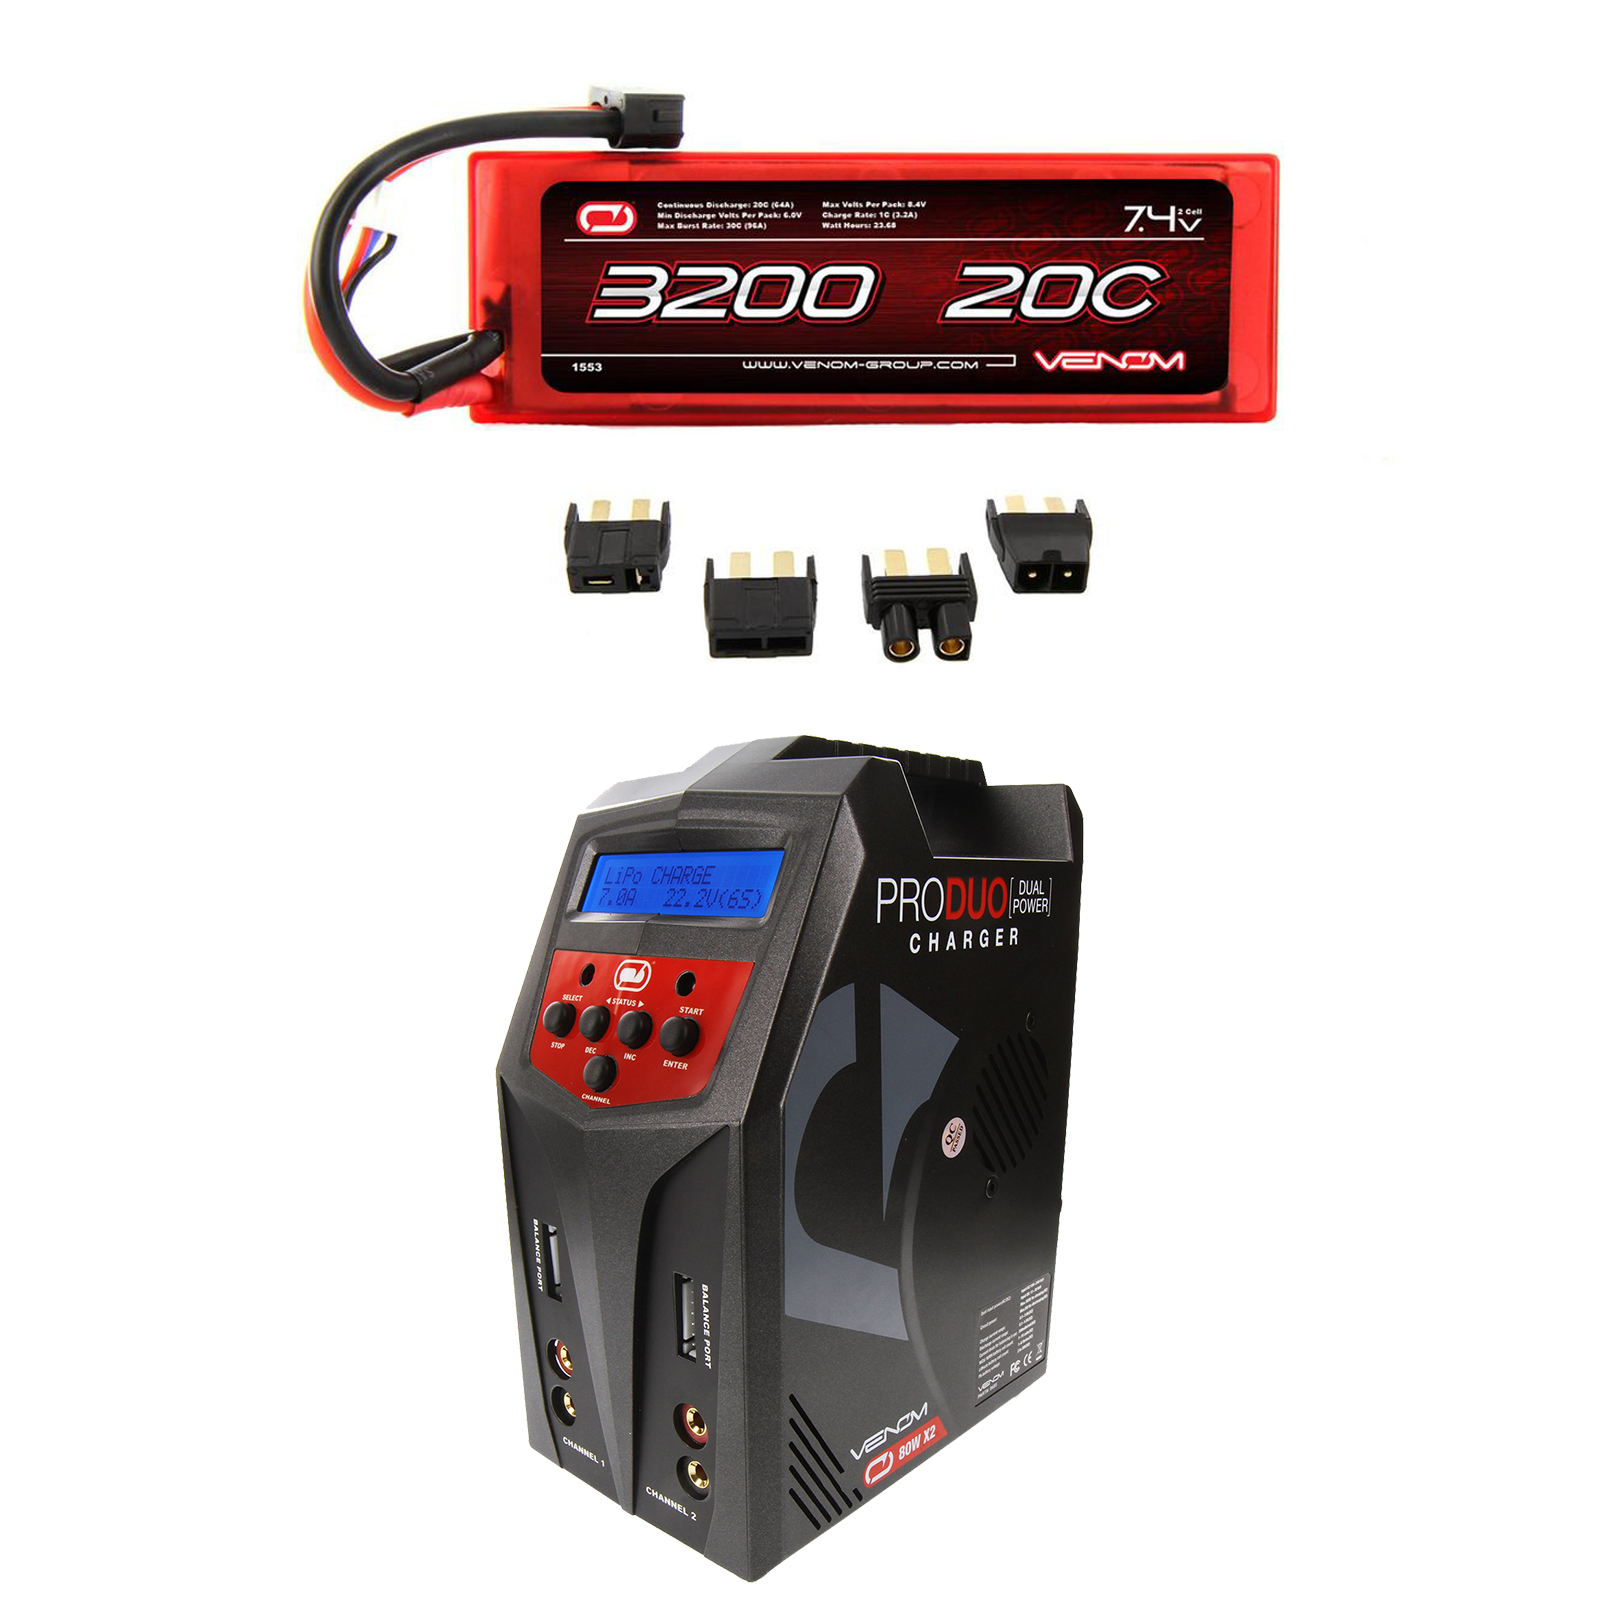 Venom 20C 2S 3200mAh 7.4 Hardcase LiPo Battery with Universal Plug and Venom Pro Duo 80W X2 Dual AC DC 7A LiPo... by Venom